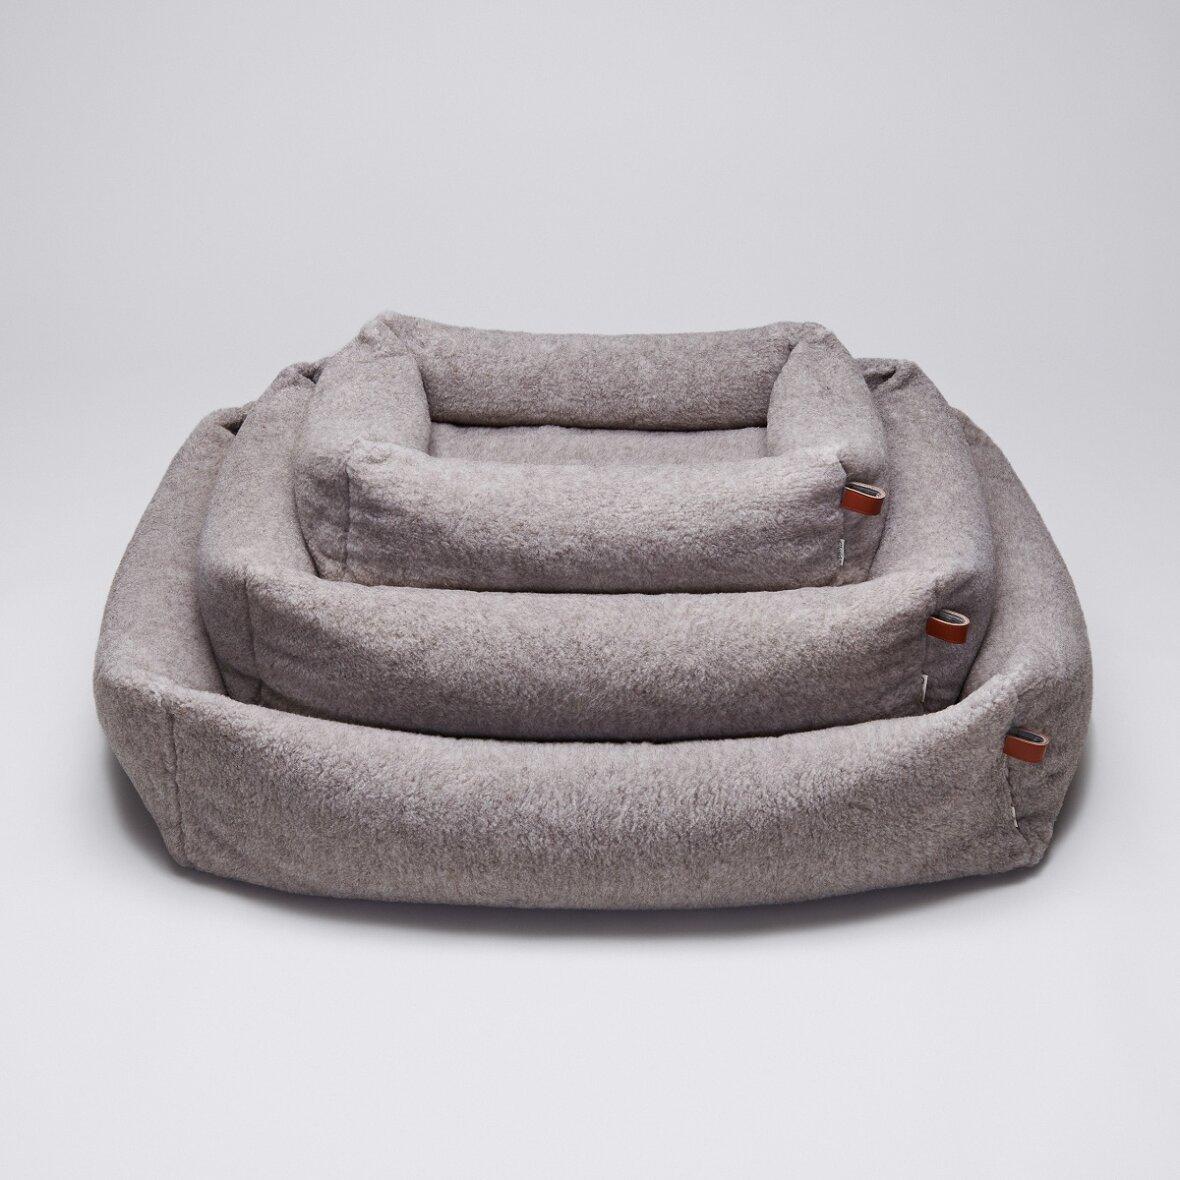 hundeseng sleepy deluxe teddy s fra cloud7 vaskbar. Black Bedroom Furniture Sets. Home Design Ideas